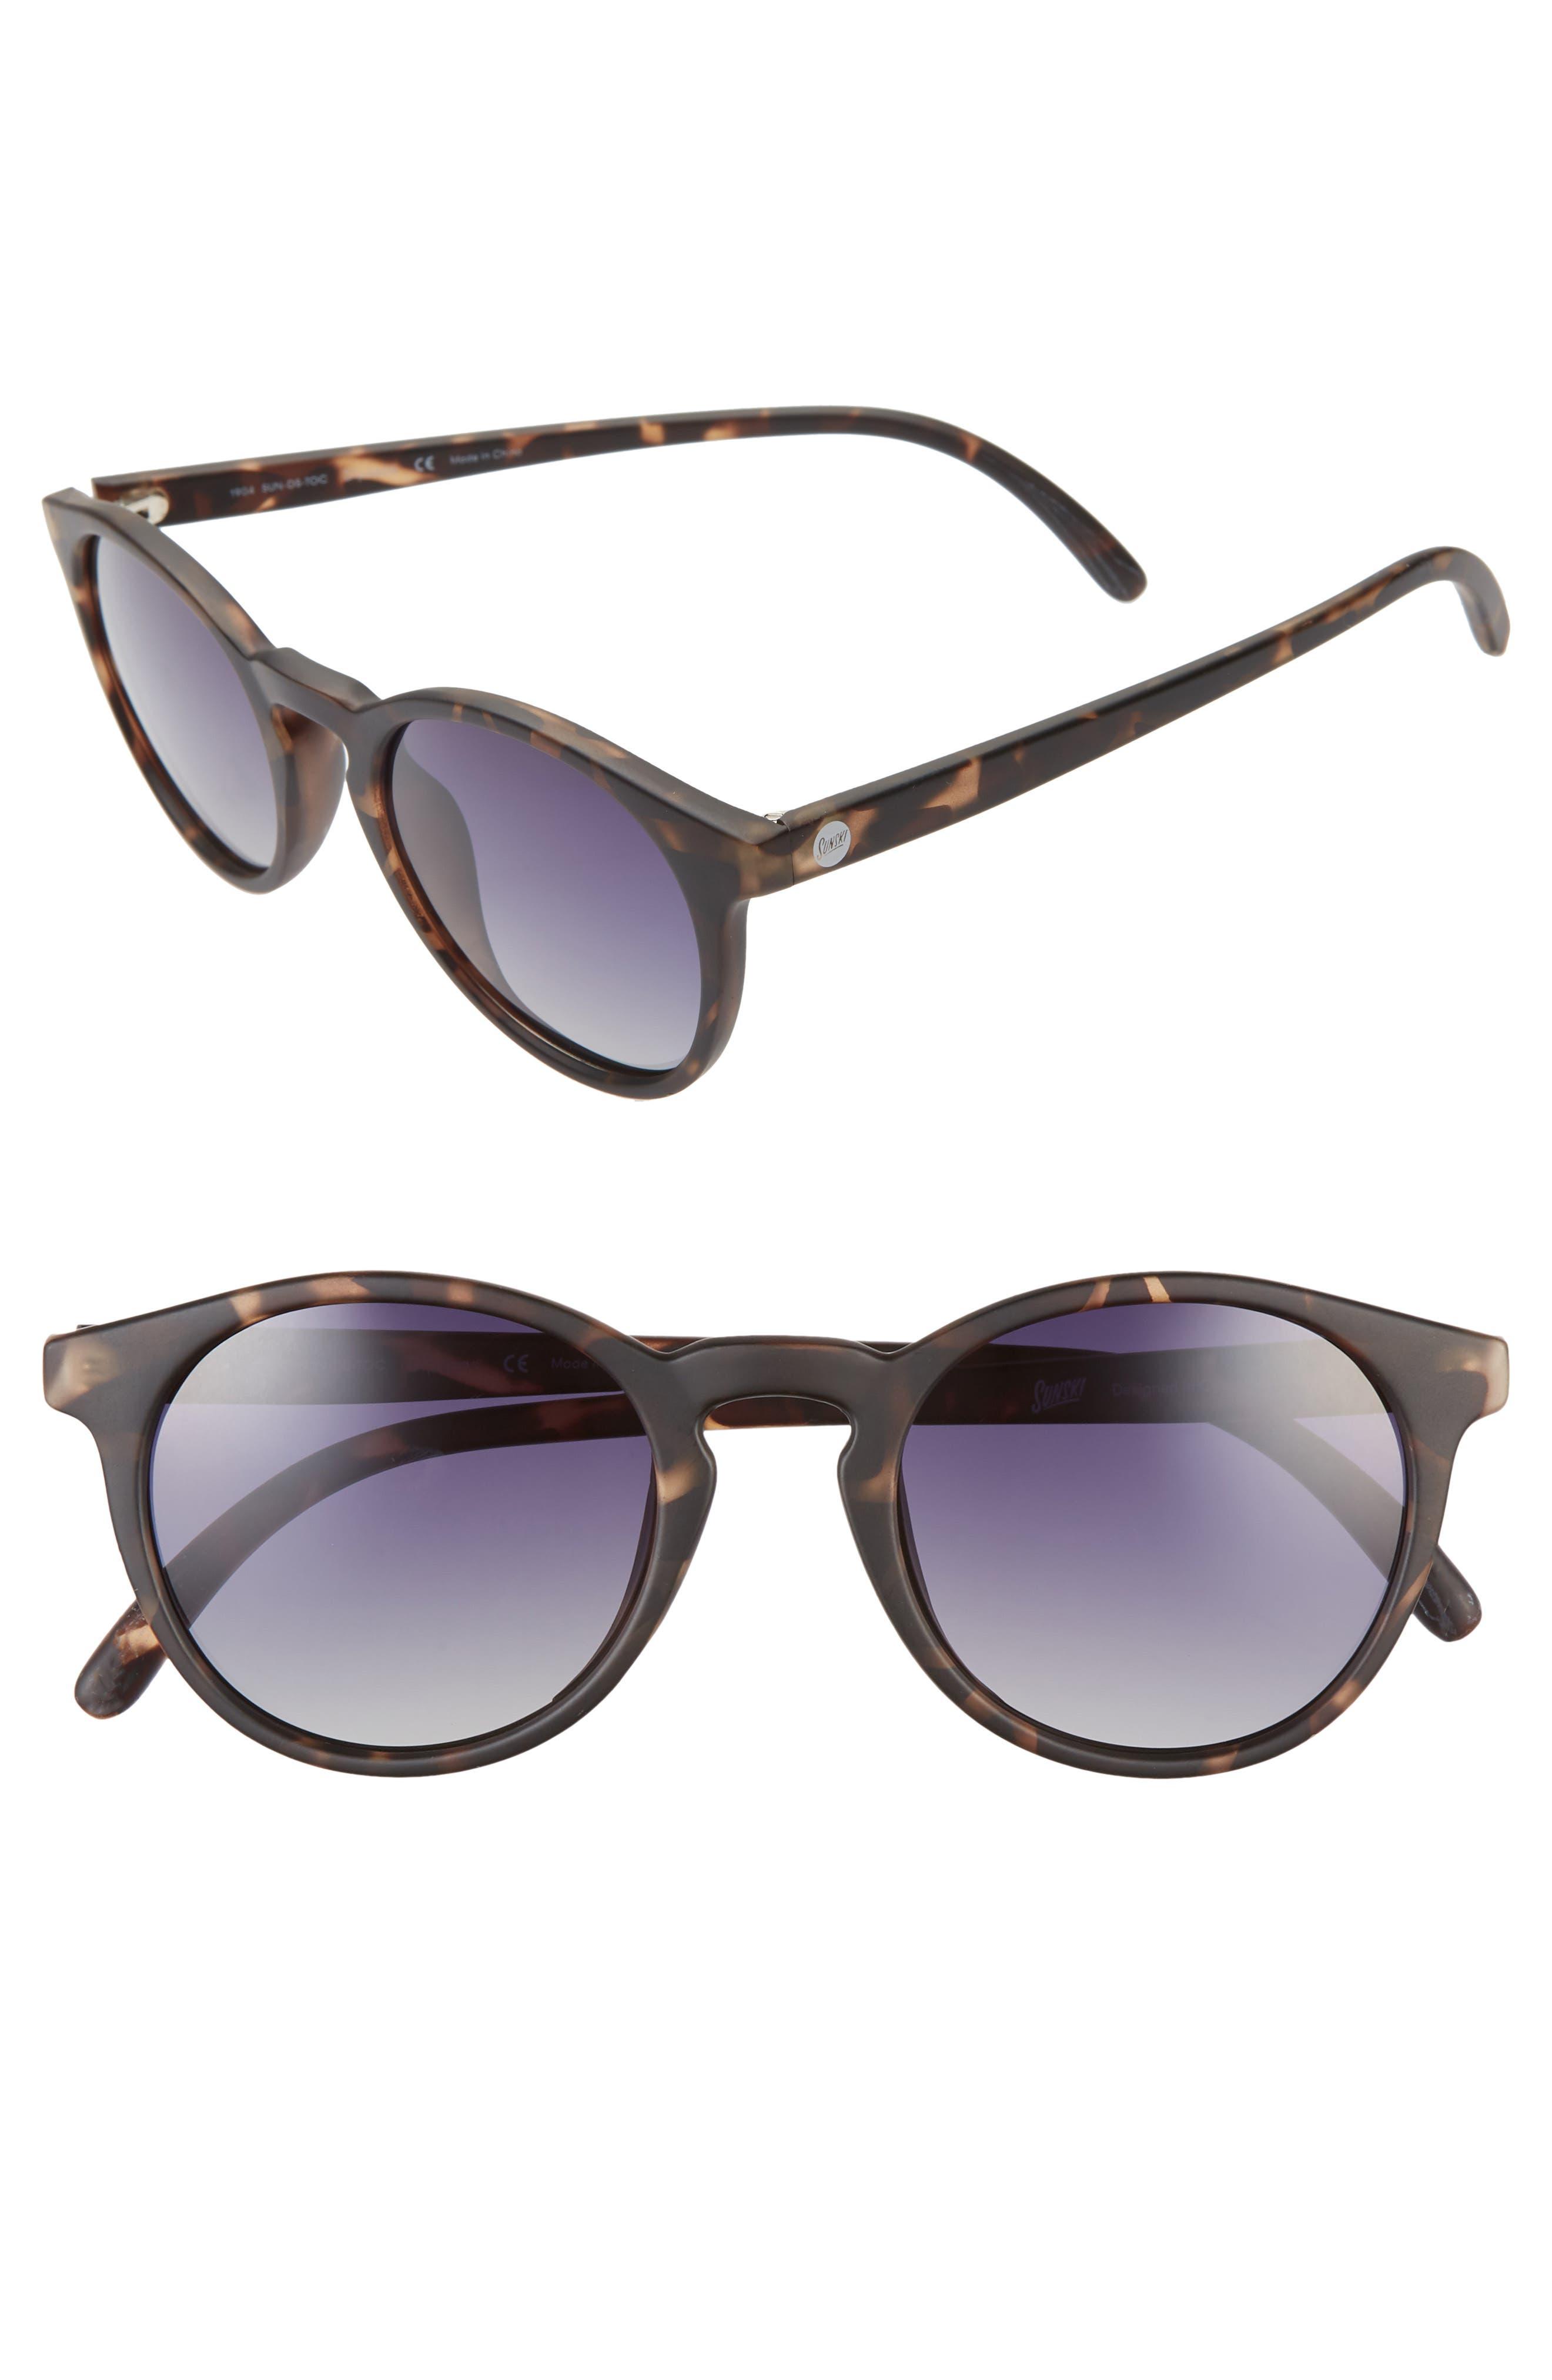 Sunski Dipsea 4m Polarized Sunglasses - Tortoise Ocean